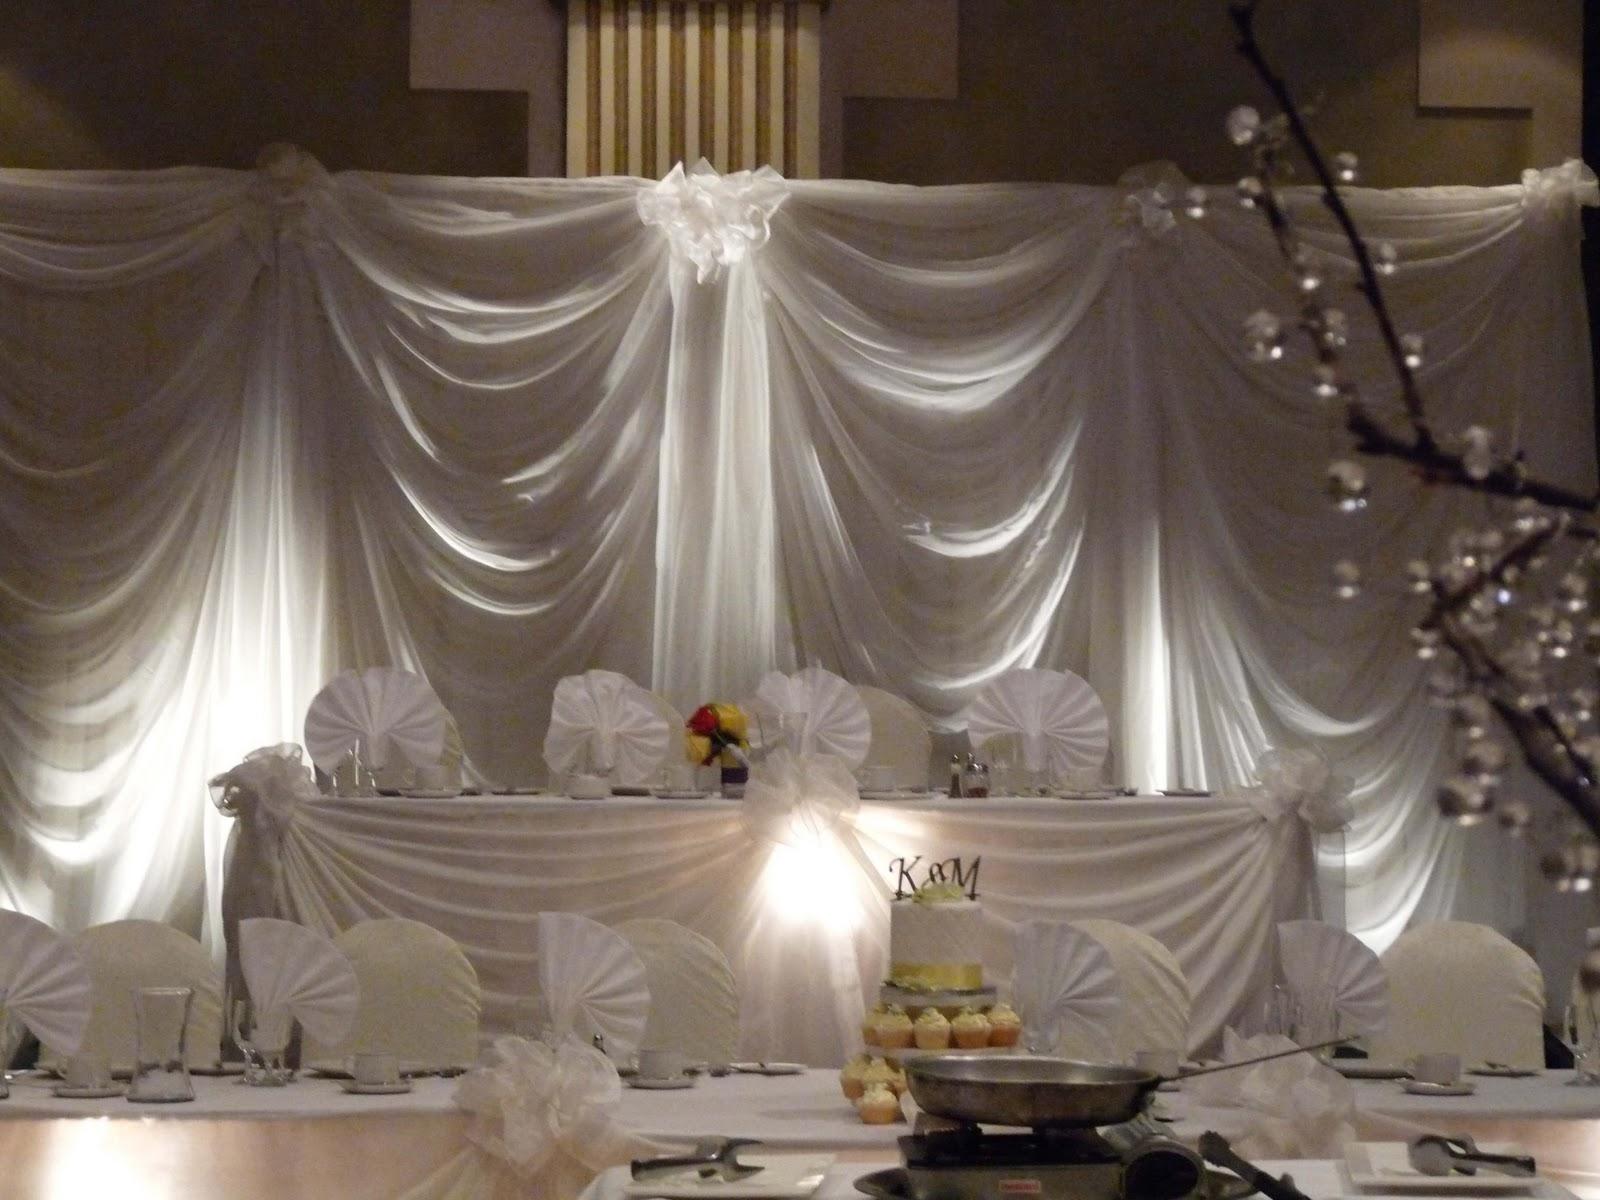 www.DECOR-RENT.com: TORONTO CHAIR COVER AND WEDDING DECORATIONS ...